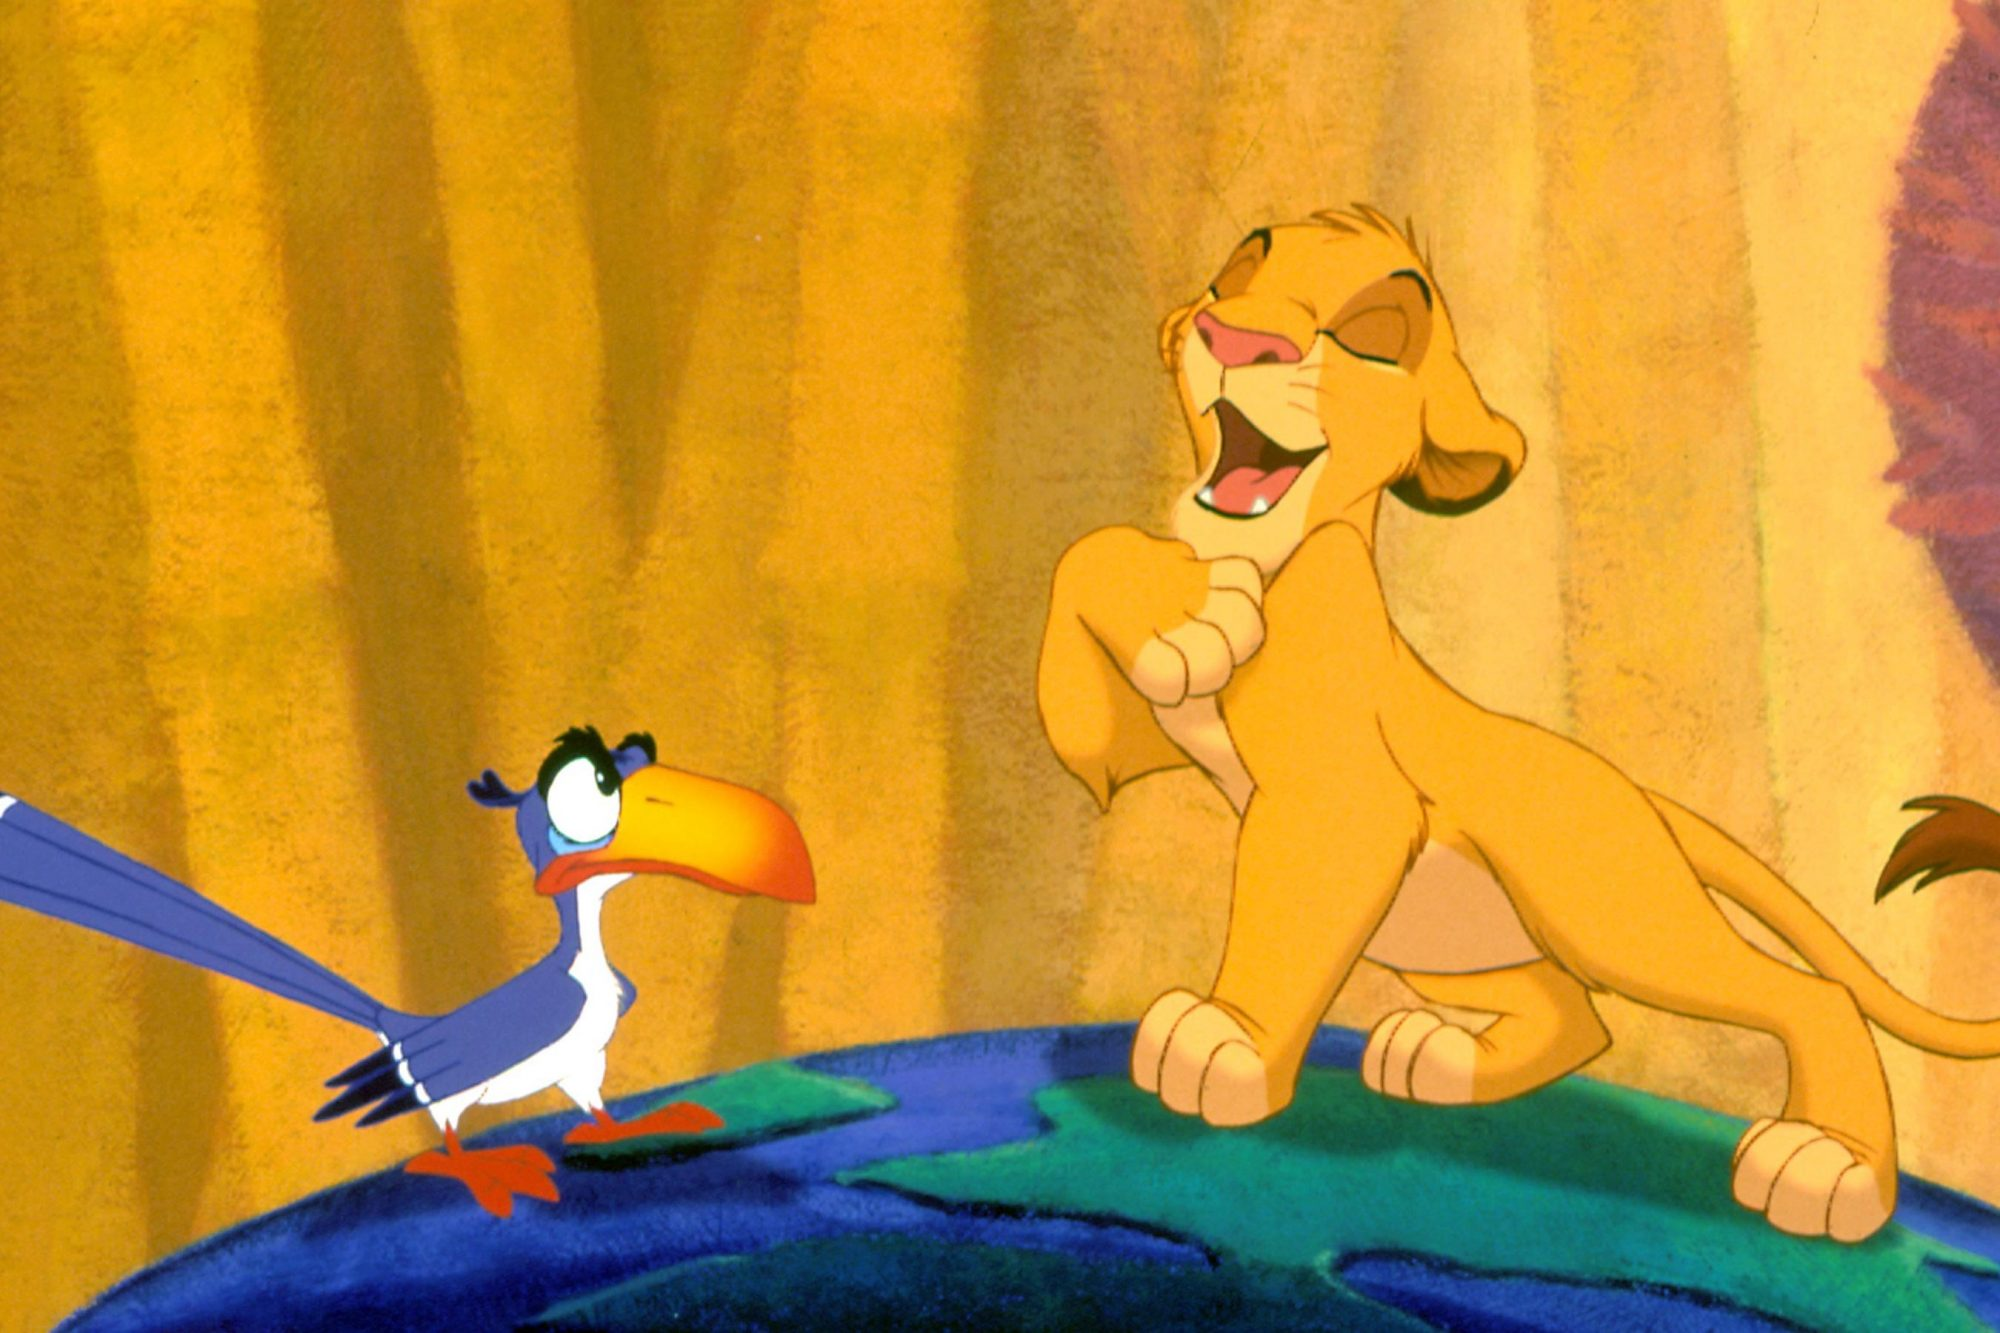 THE LION KING, Zazu, Simba, 1994. ©Buena Vista Pictures/Courtesy Everett Collection